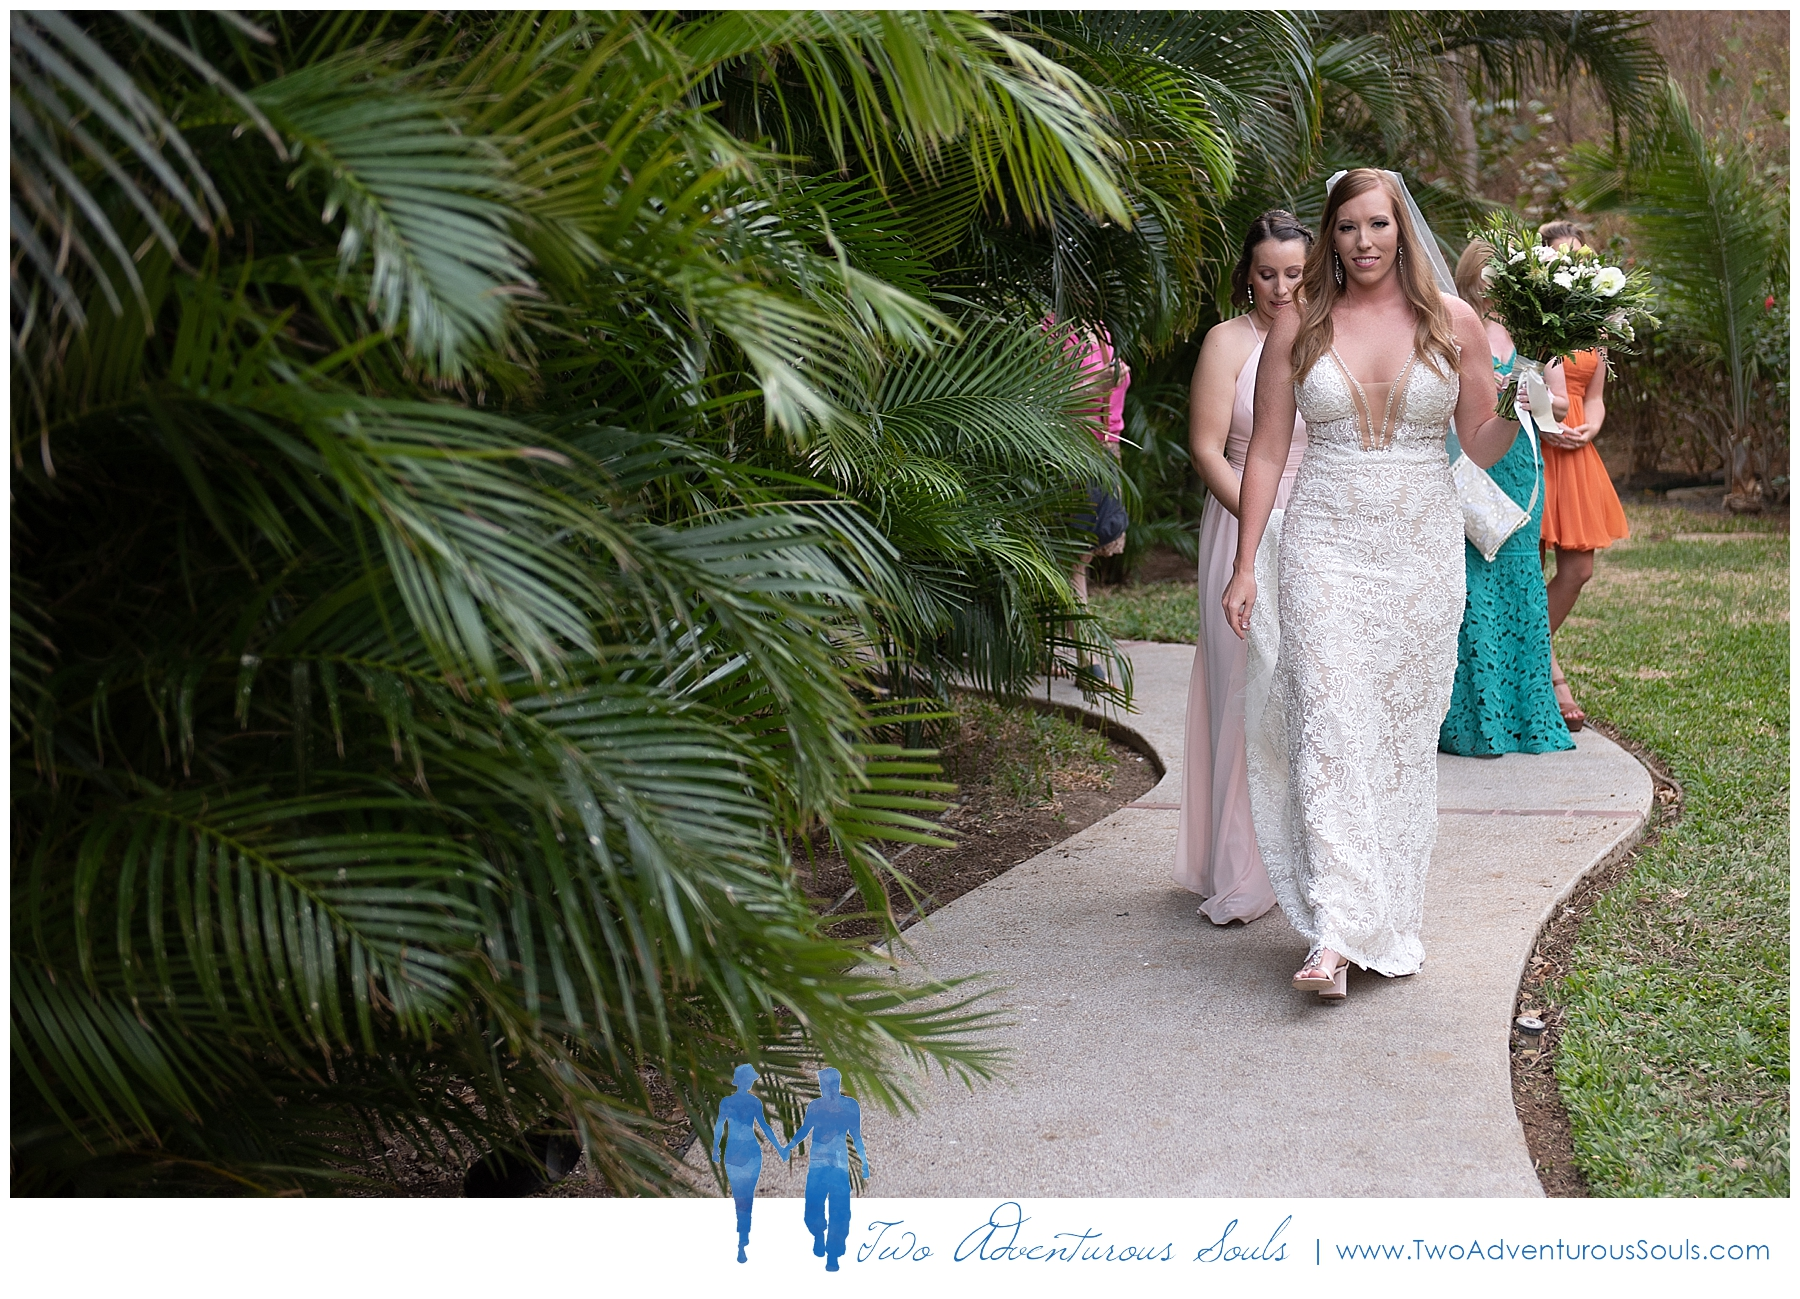 Costa Rica Wedding Photographers, Dreams las Mareas Wedding, Destination Wedding Photographers, Two Adventurous Souls - 022219_0017.jpg